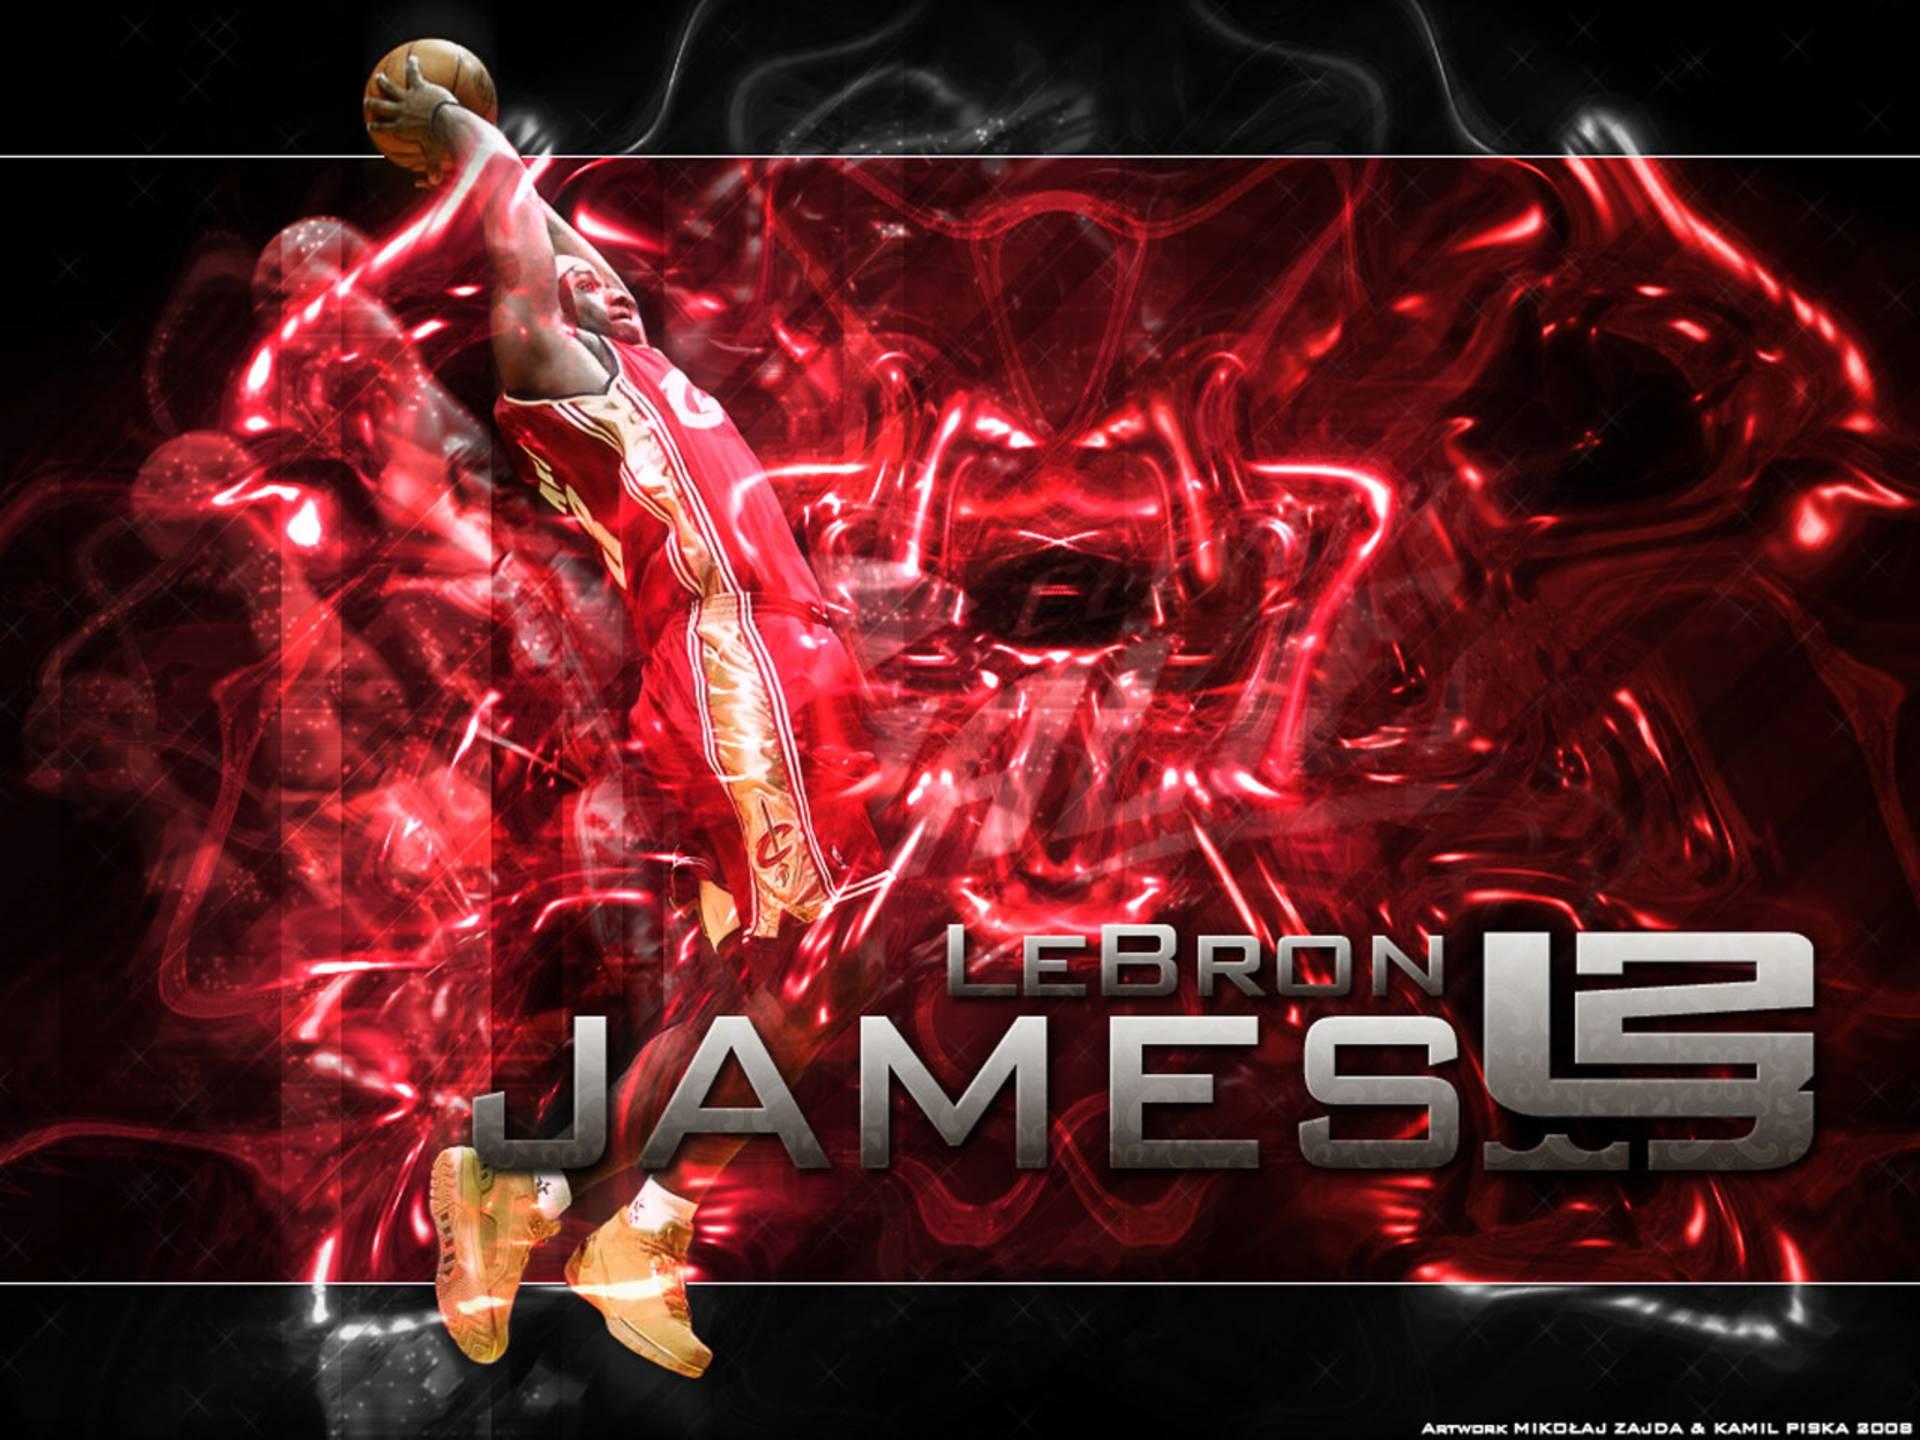 Lebron James Basketball Dunk Wallpaper